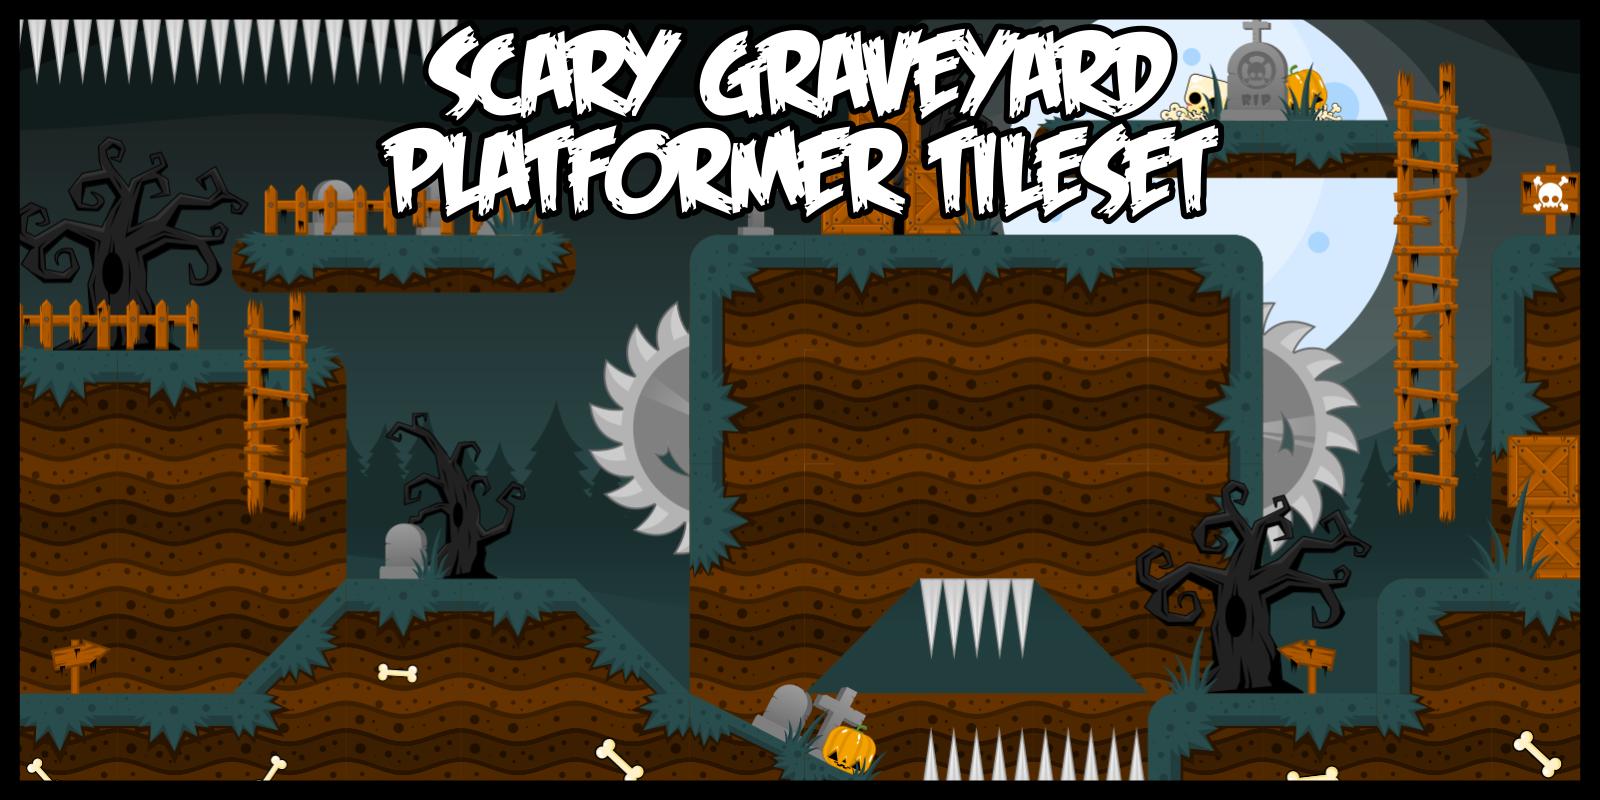 Scary Graveyard - Platformer Tileset